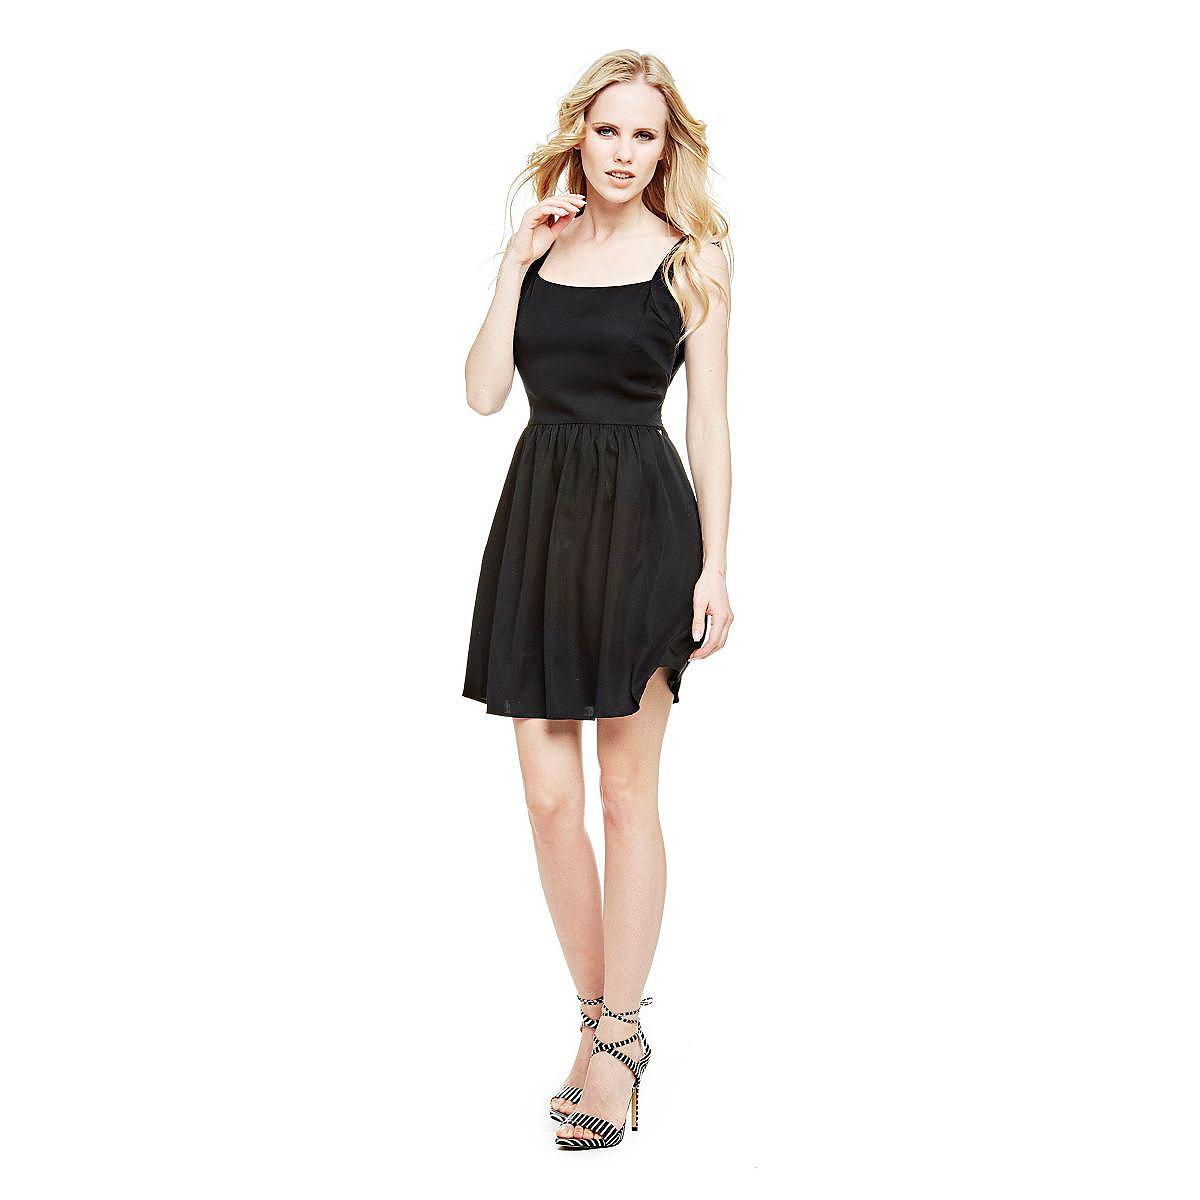 Guess jurk met knoop zwart